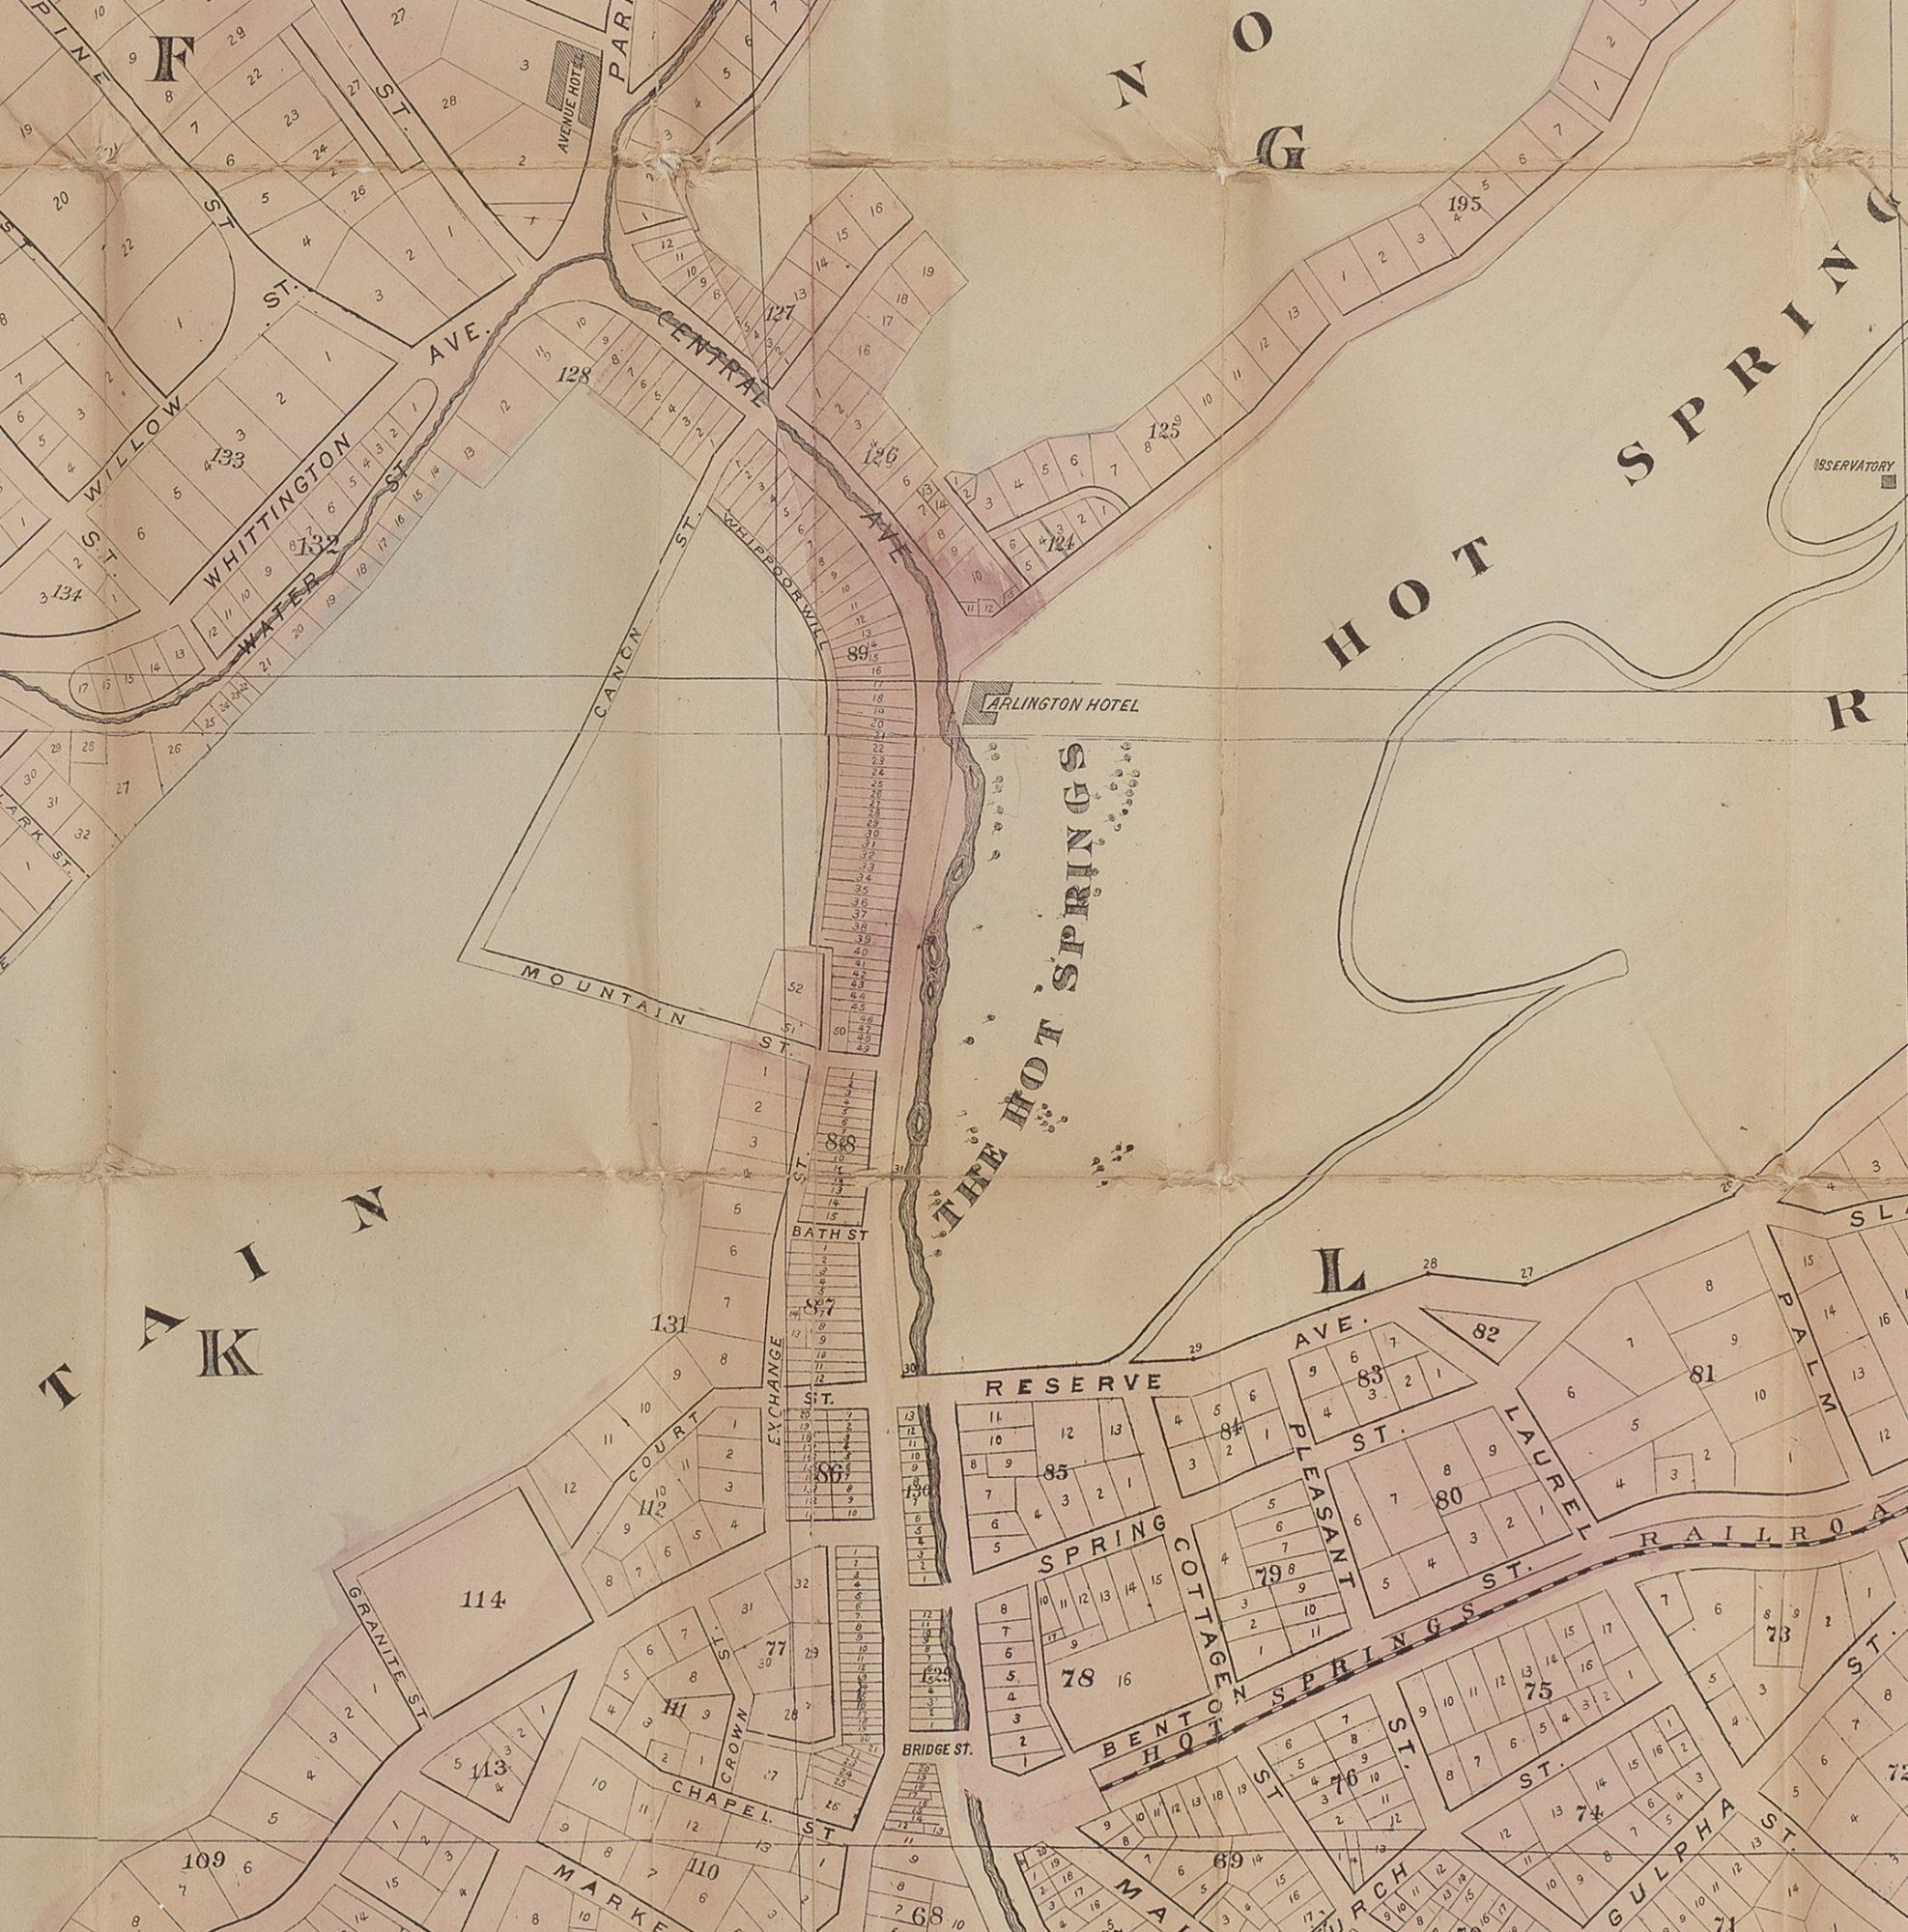 Hot Springs Arkansas Rare Antique Maps - Arkansas land ownership maps